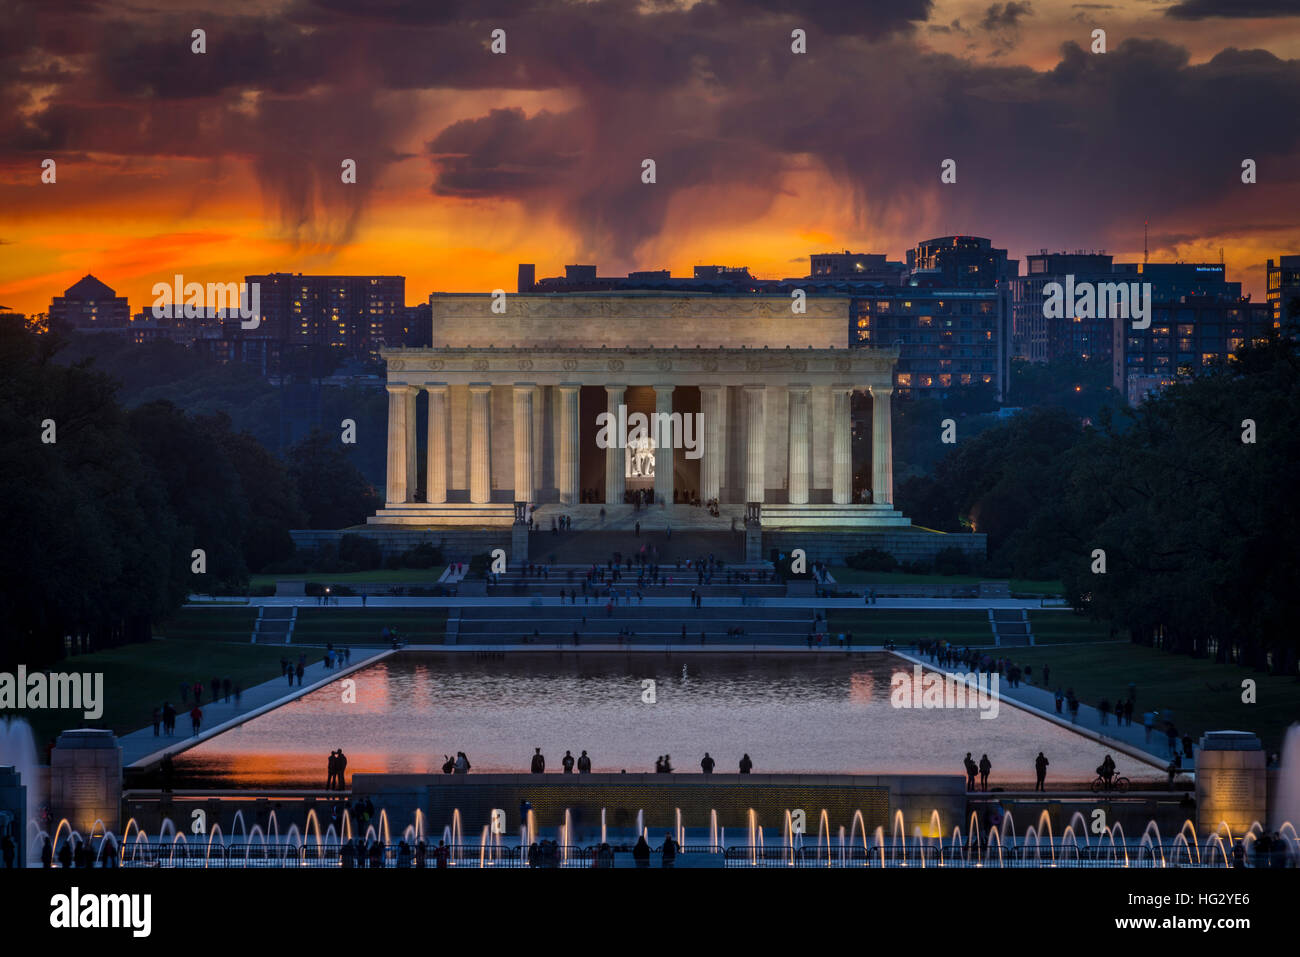 Lincoln Memorial, Washington DC, EE.UU. Imagen De Stock